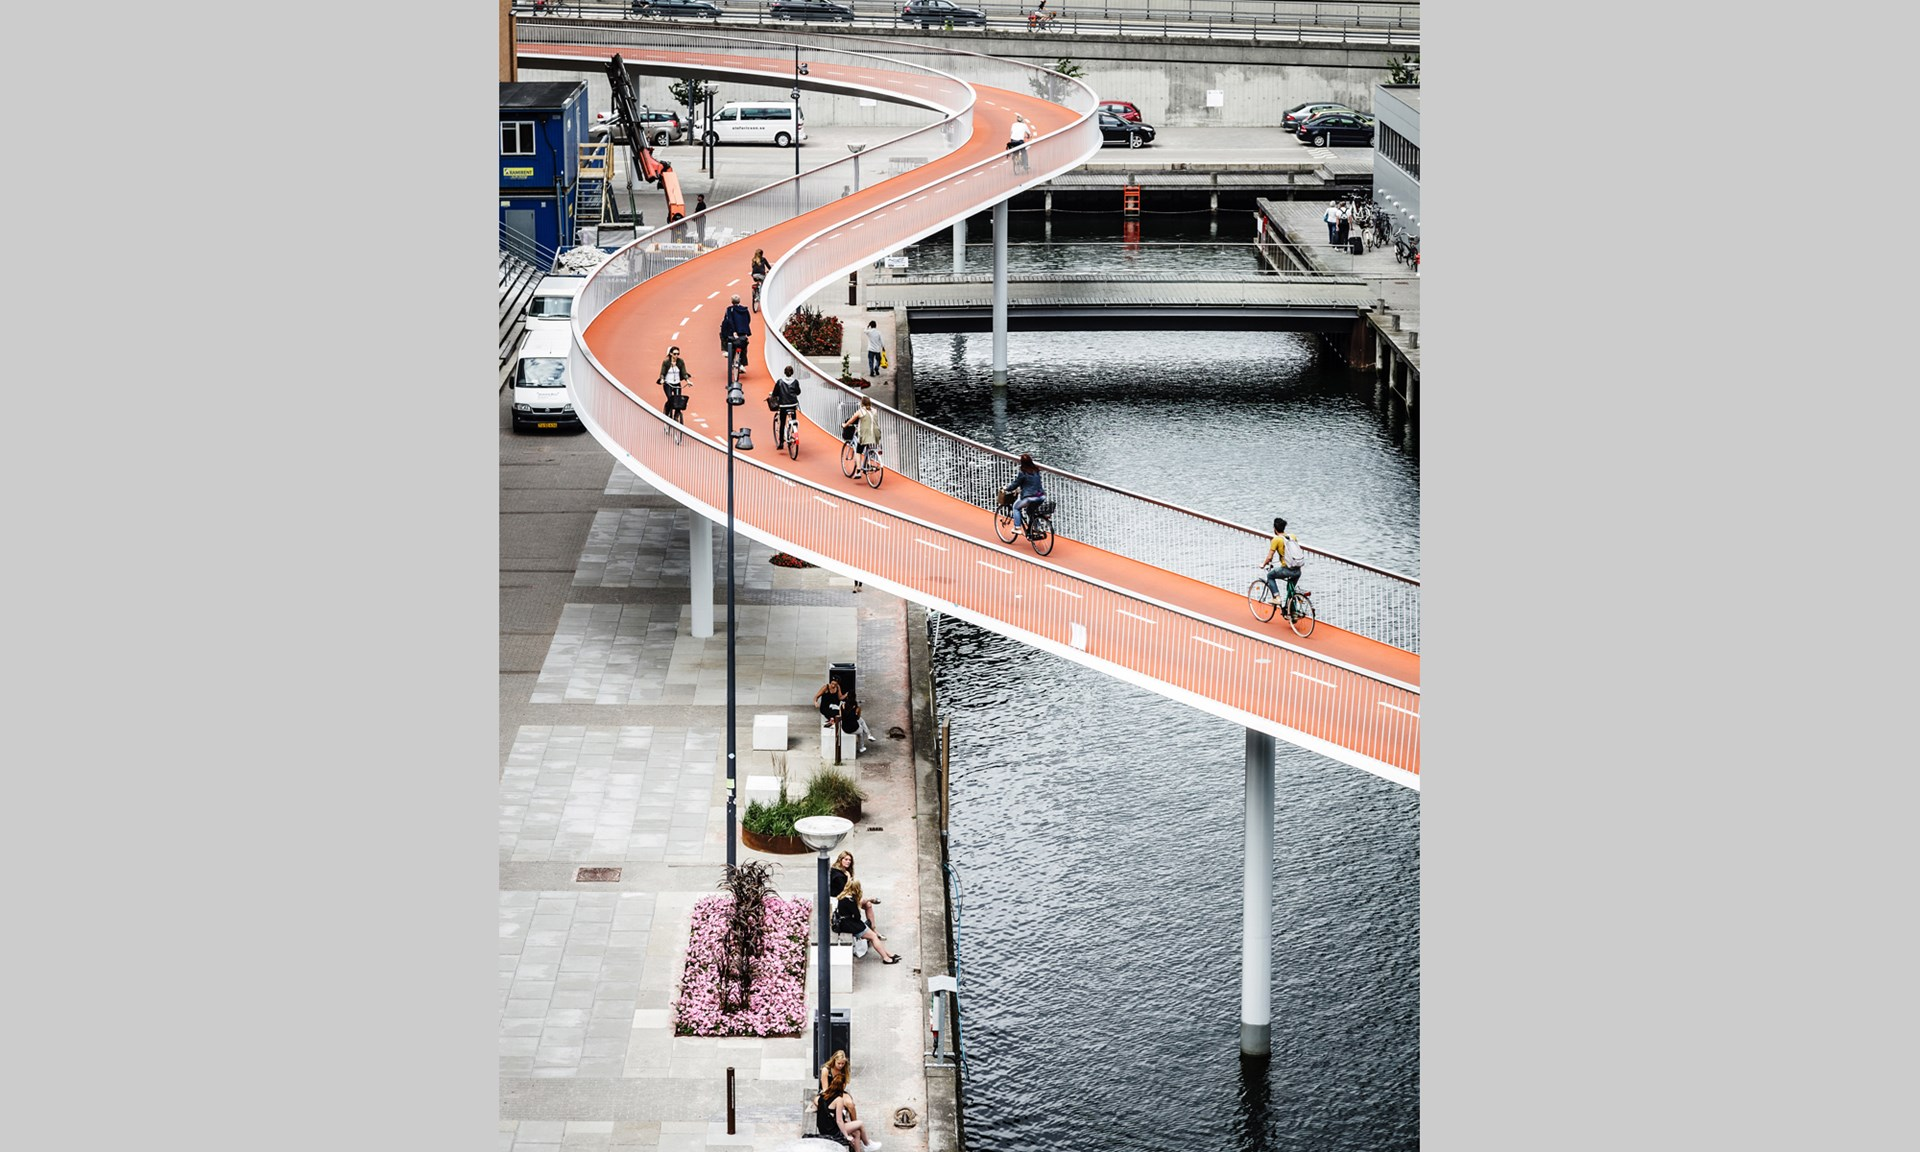 bicycle-snake-hisheji (2)